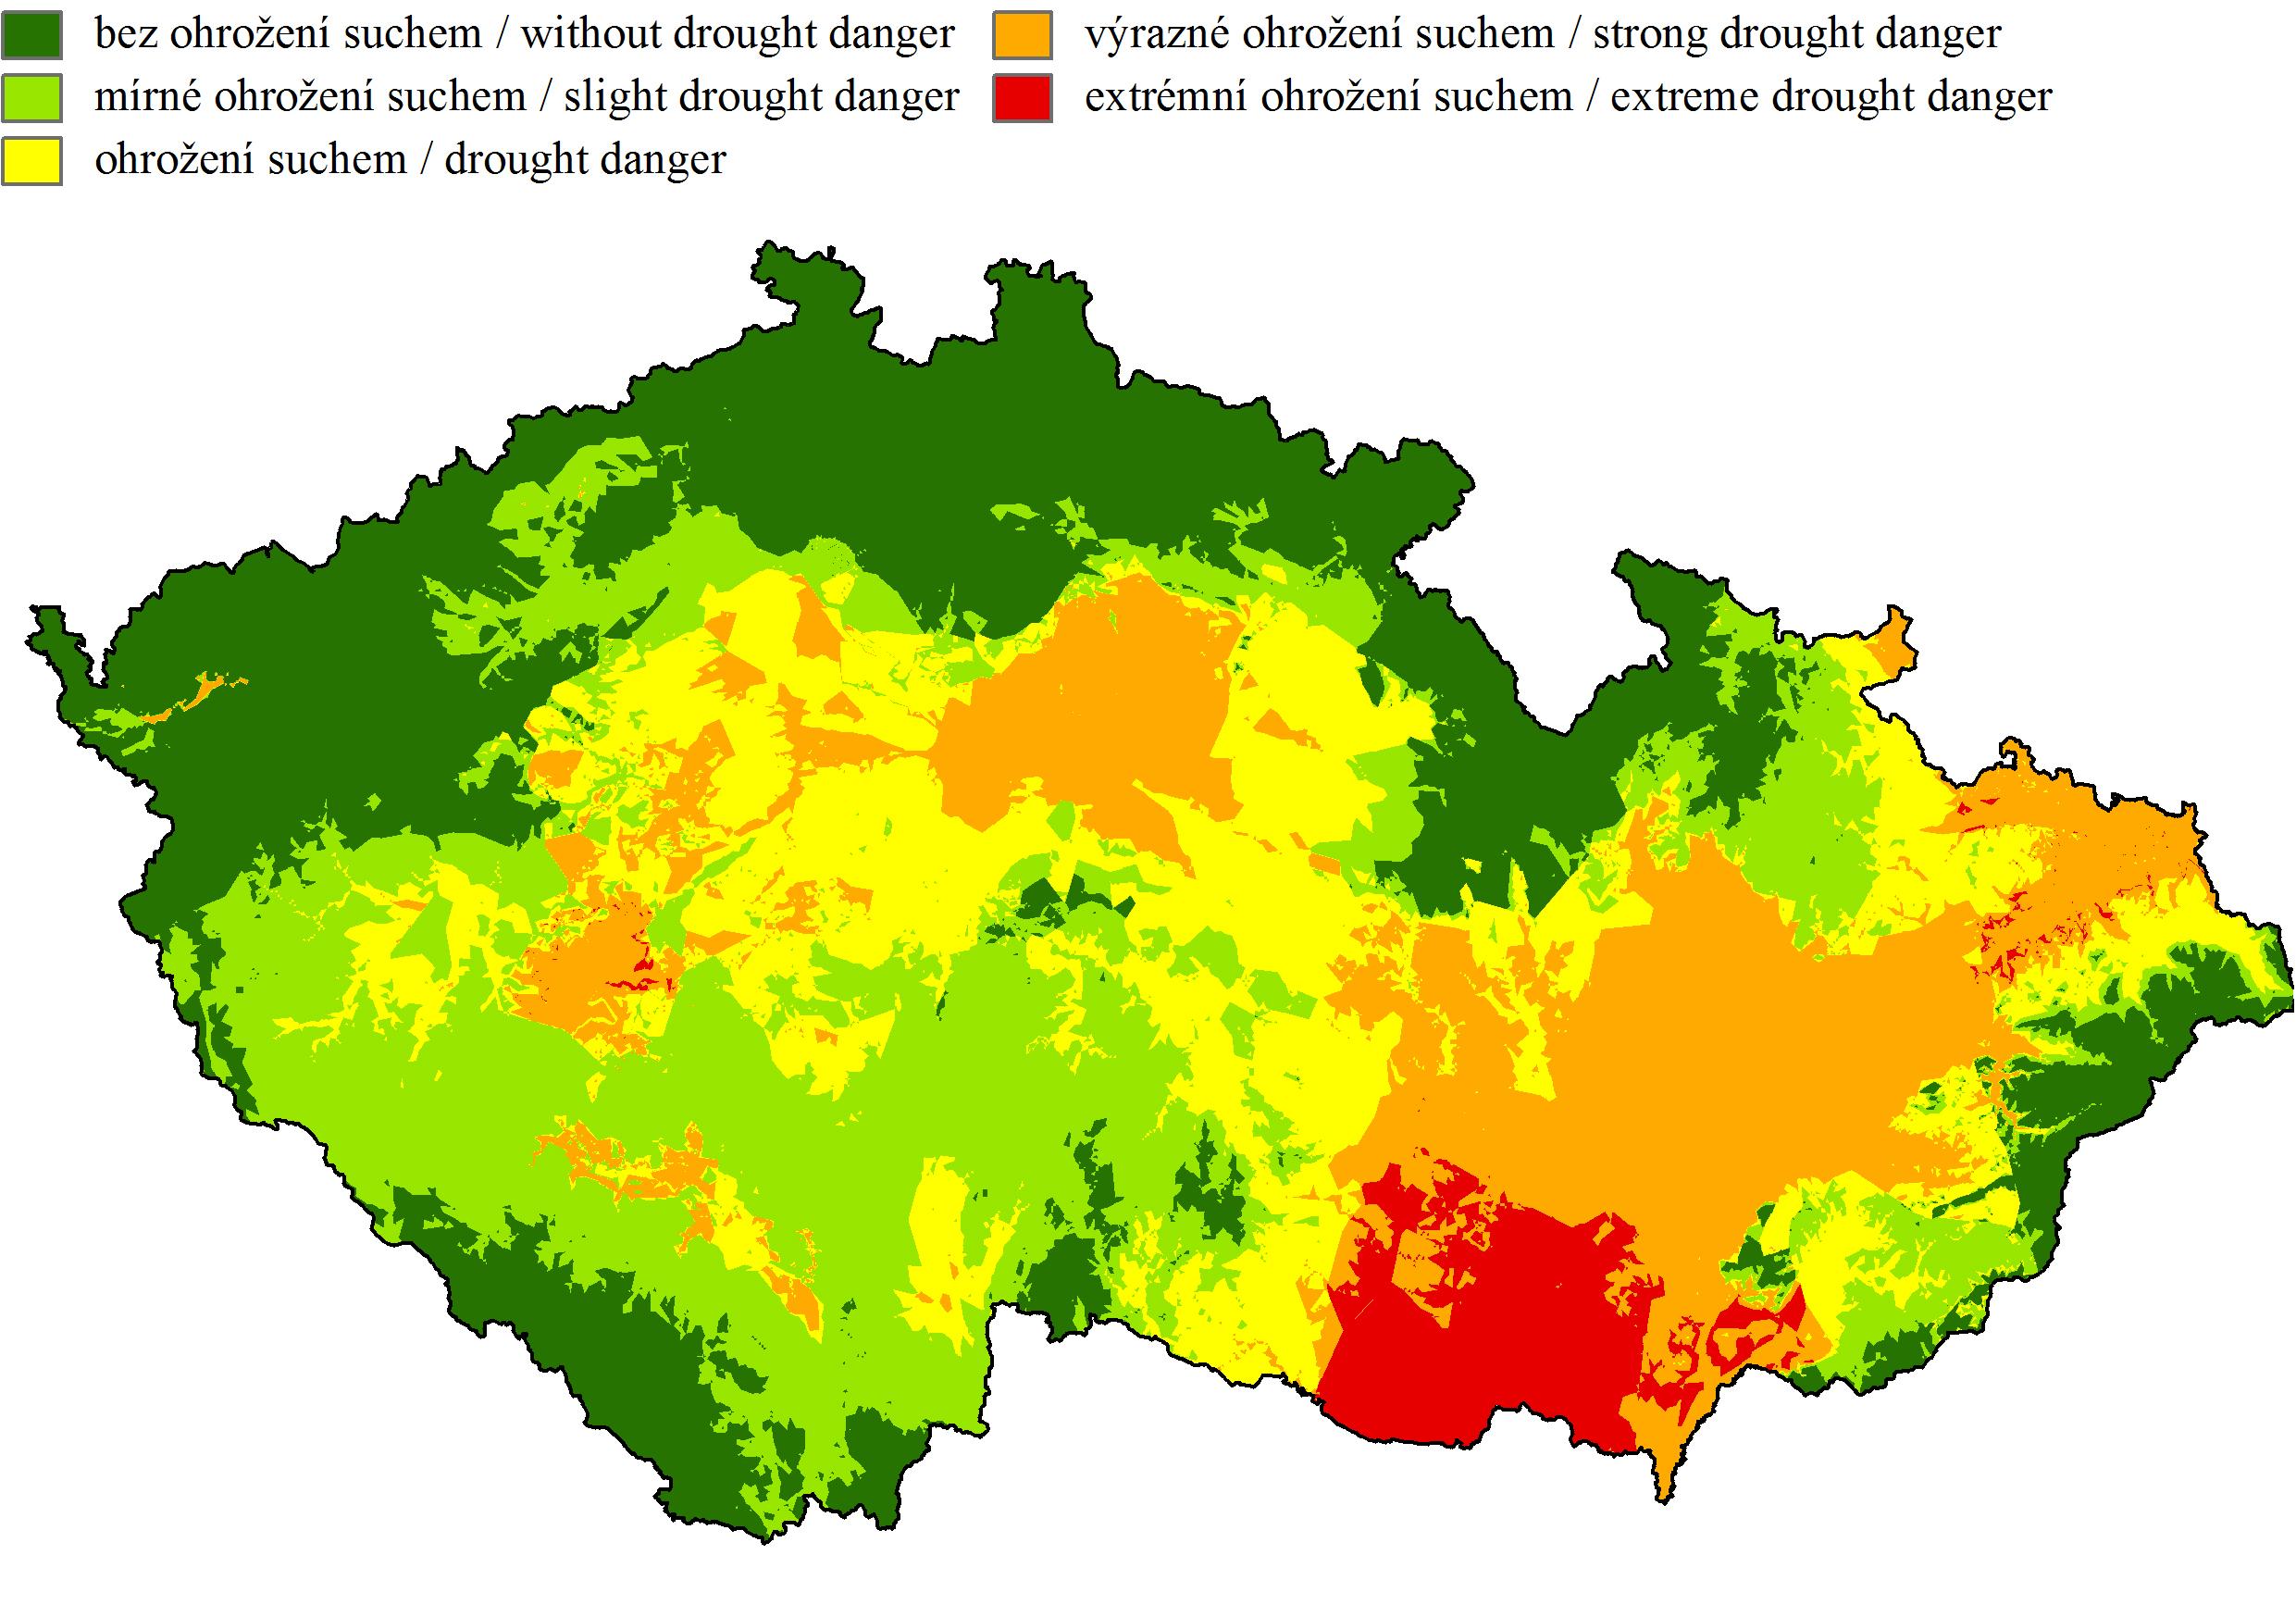 Mapy Ohrozeni Smrkovych Porostu Suchem Pomohou Rozpoznat Rizika